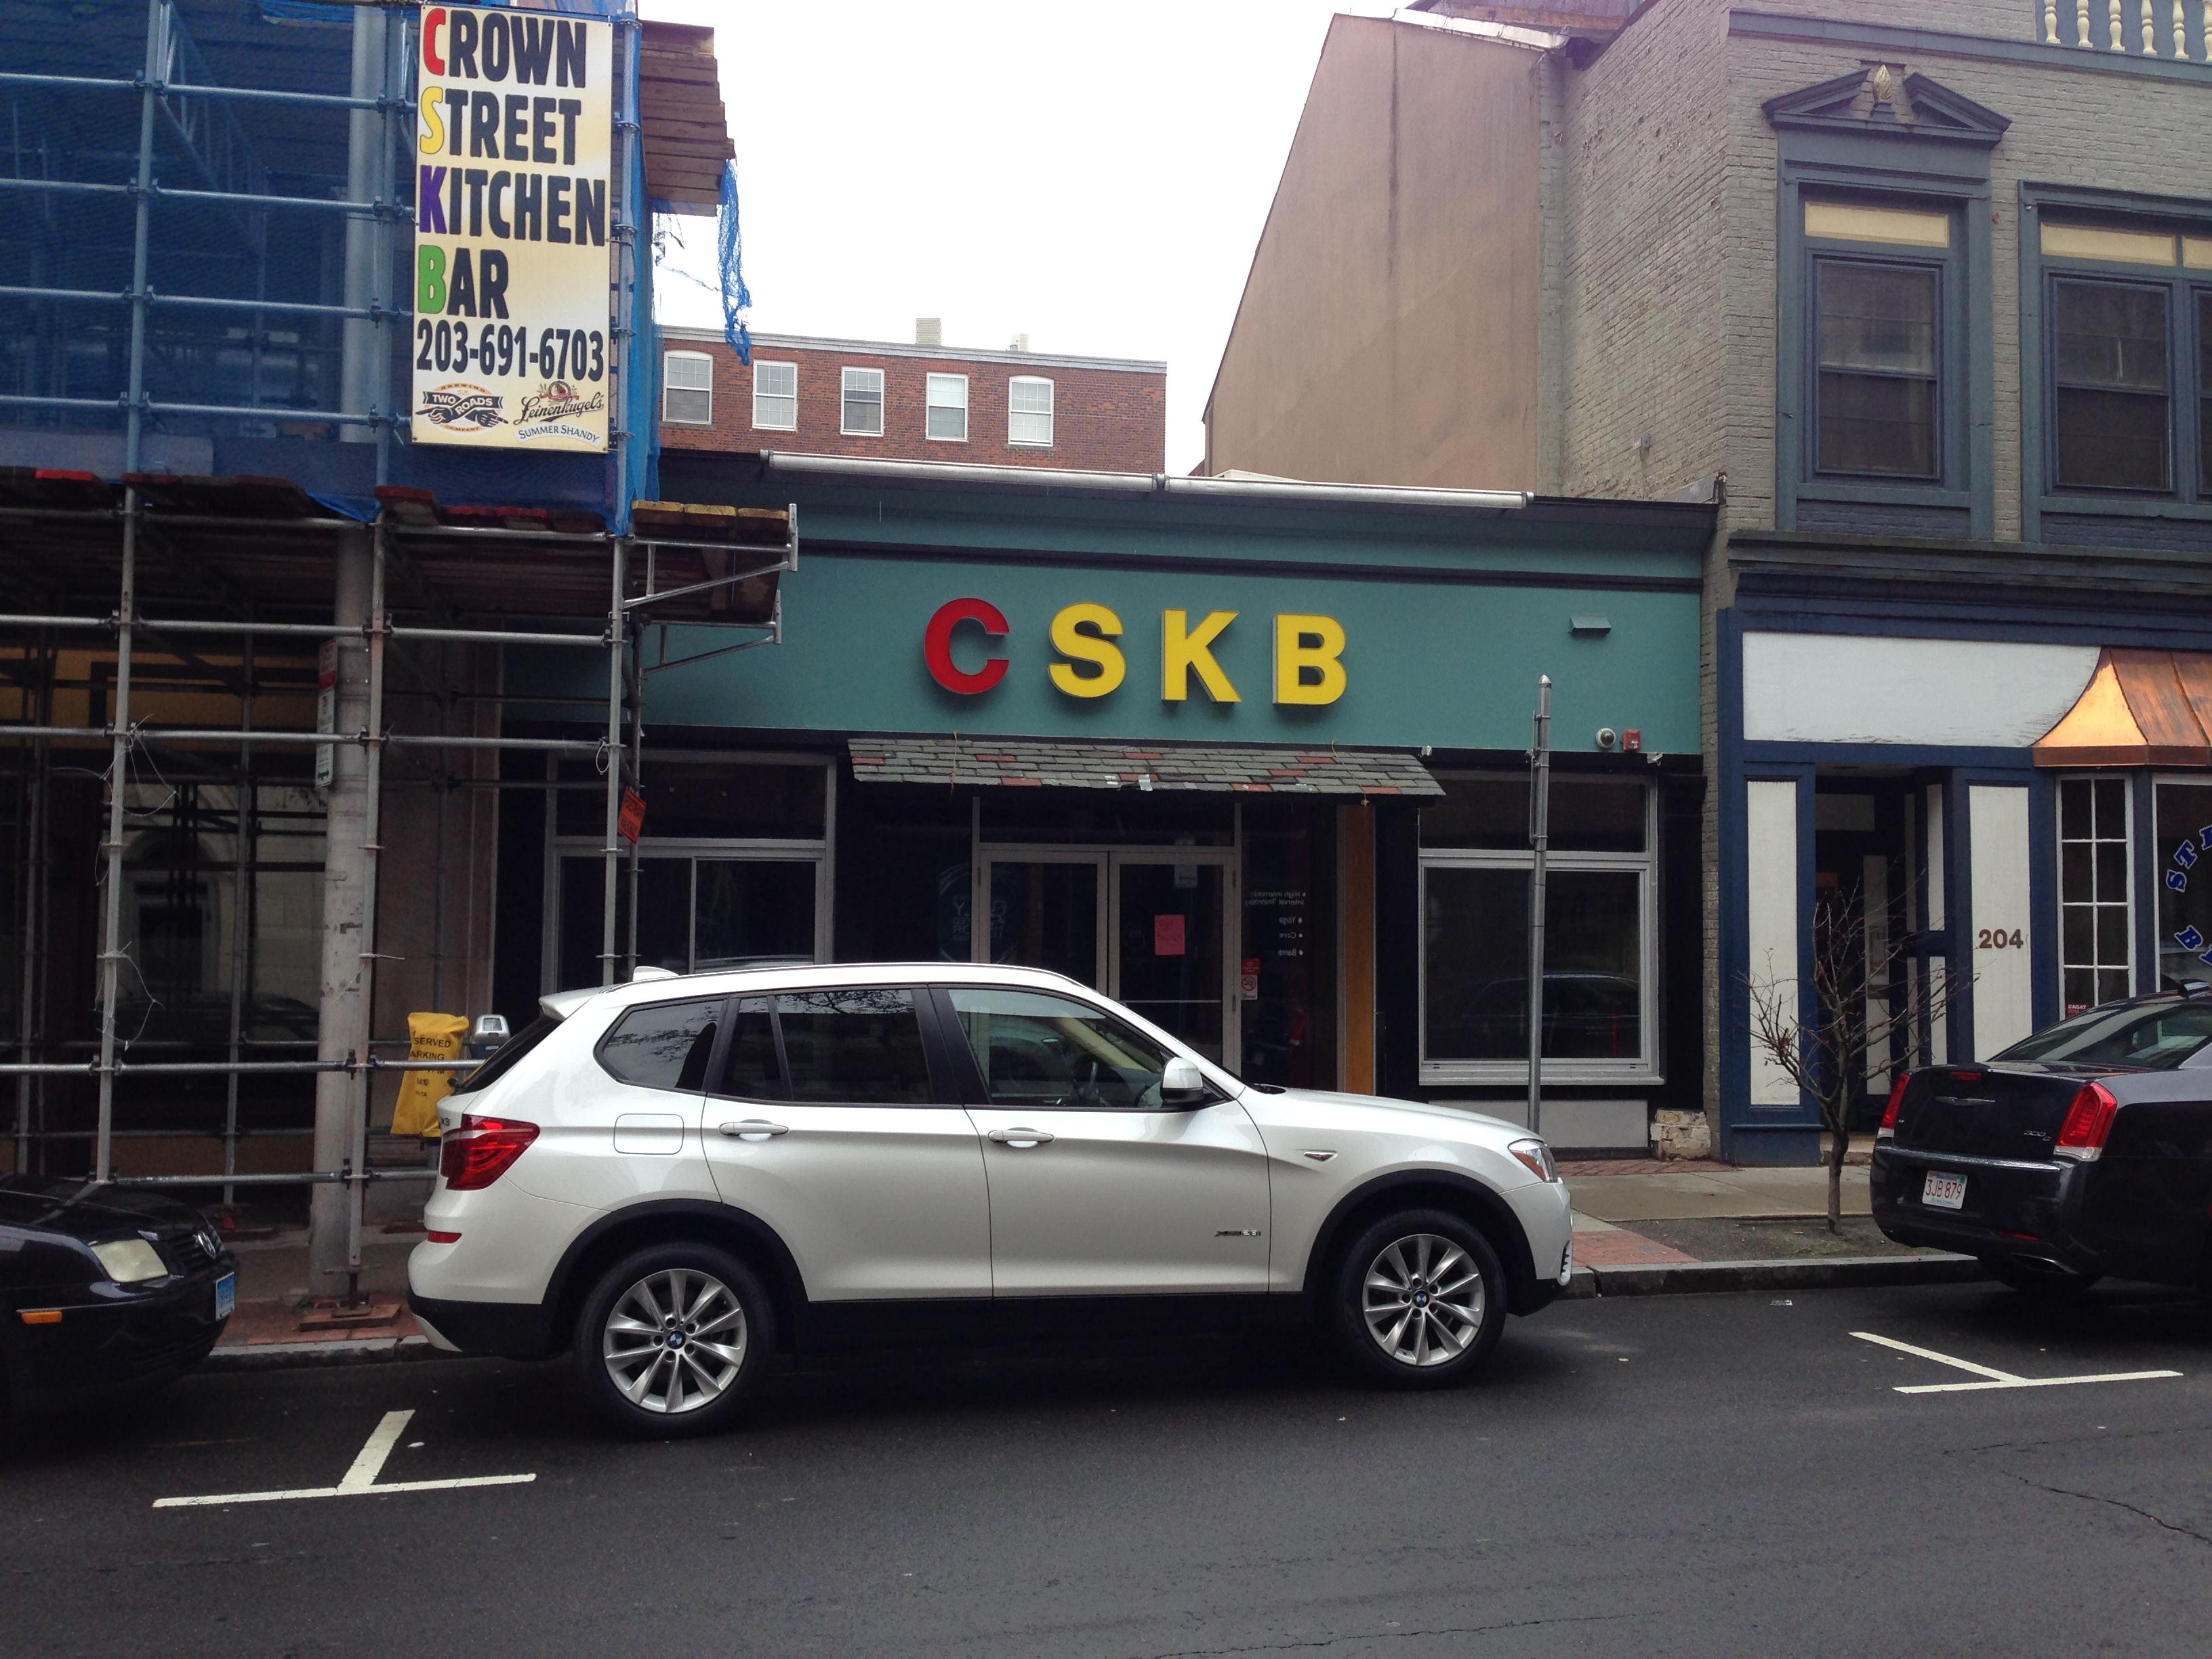 Restaurants On Crown Street New Haven